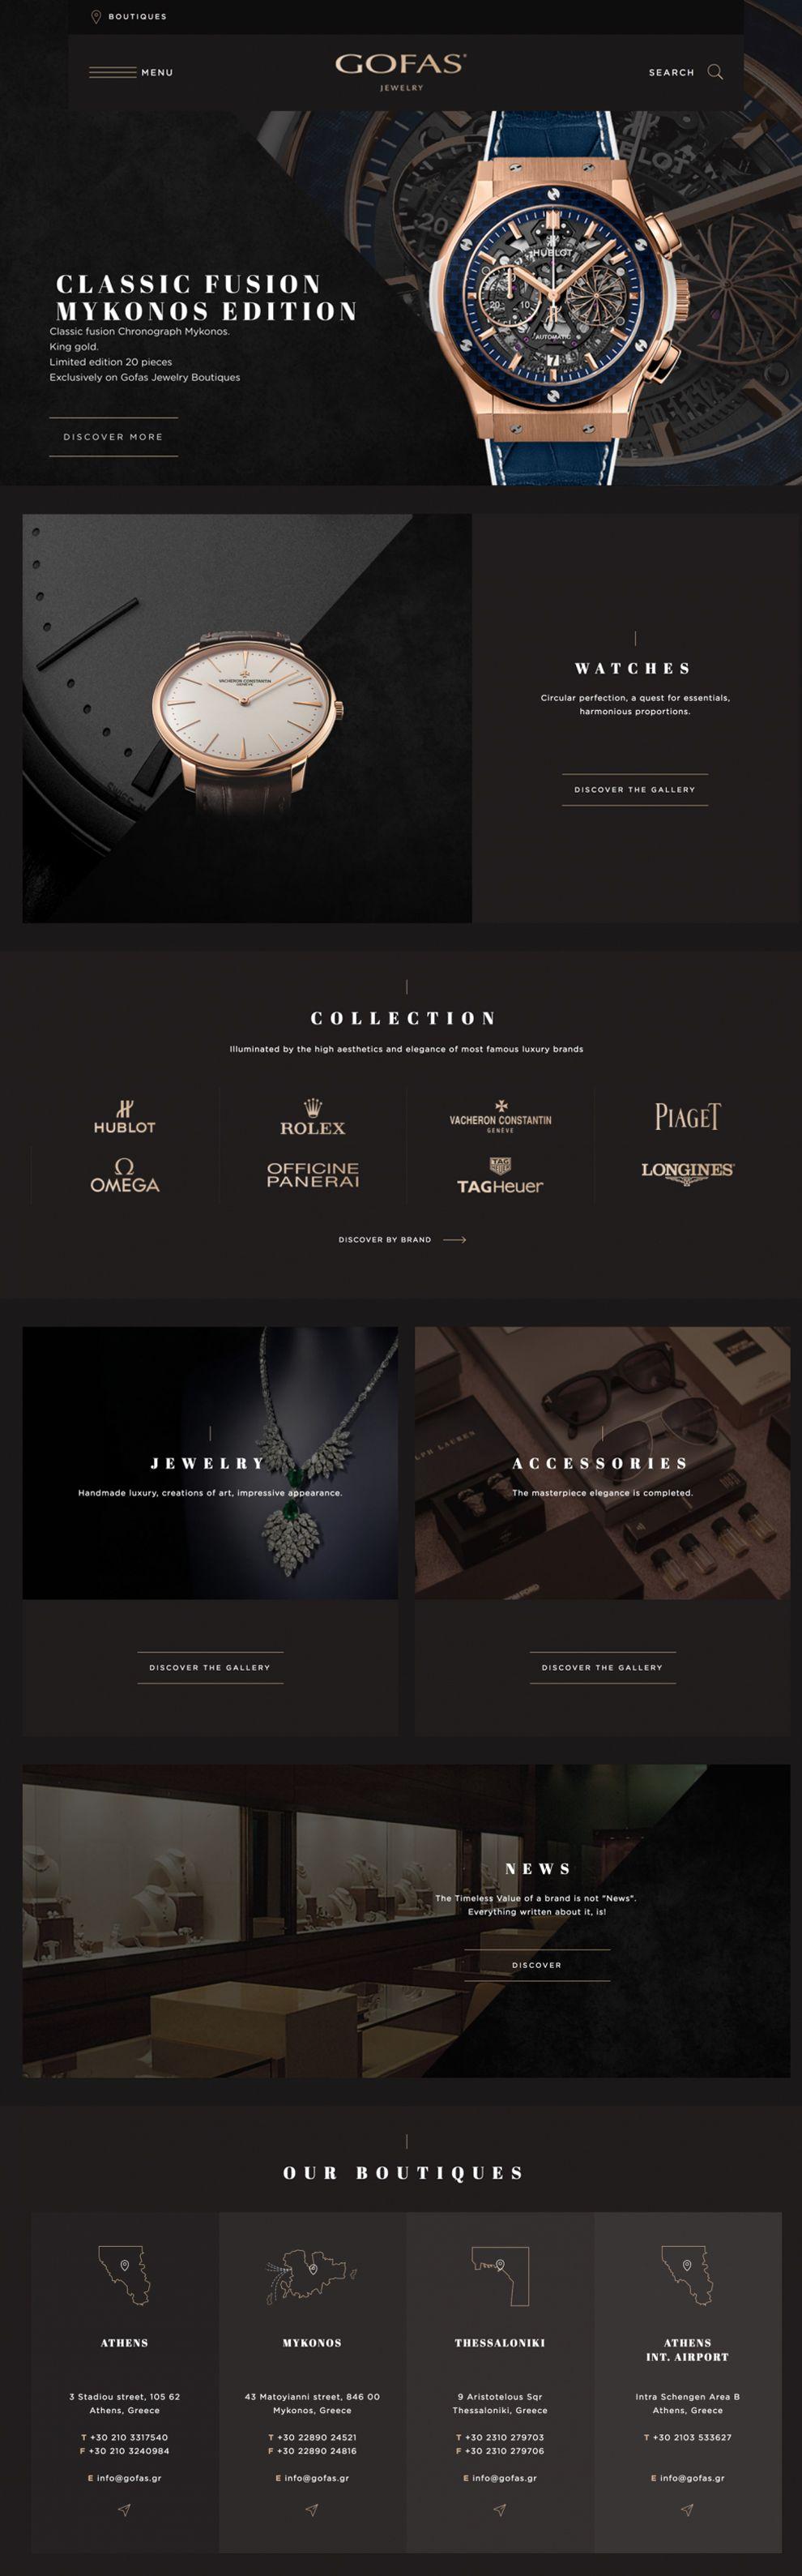 Gofas Beautiful Homepage